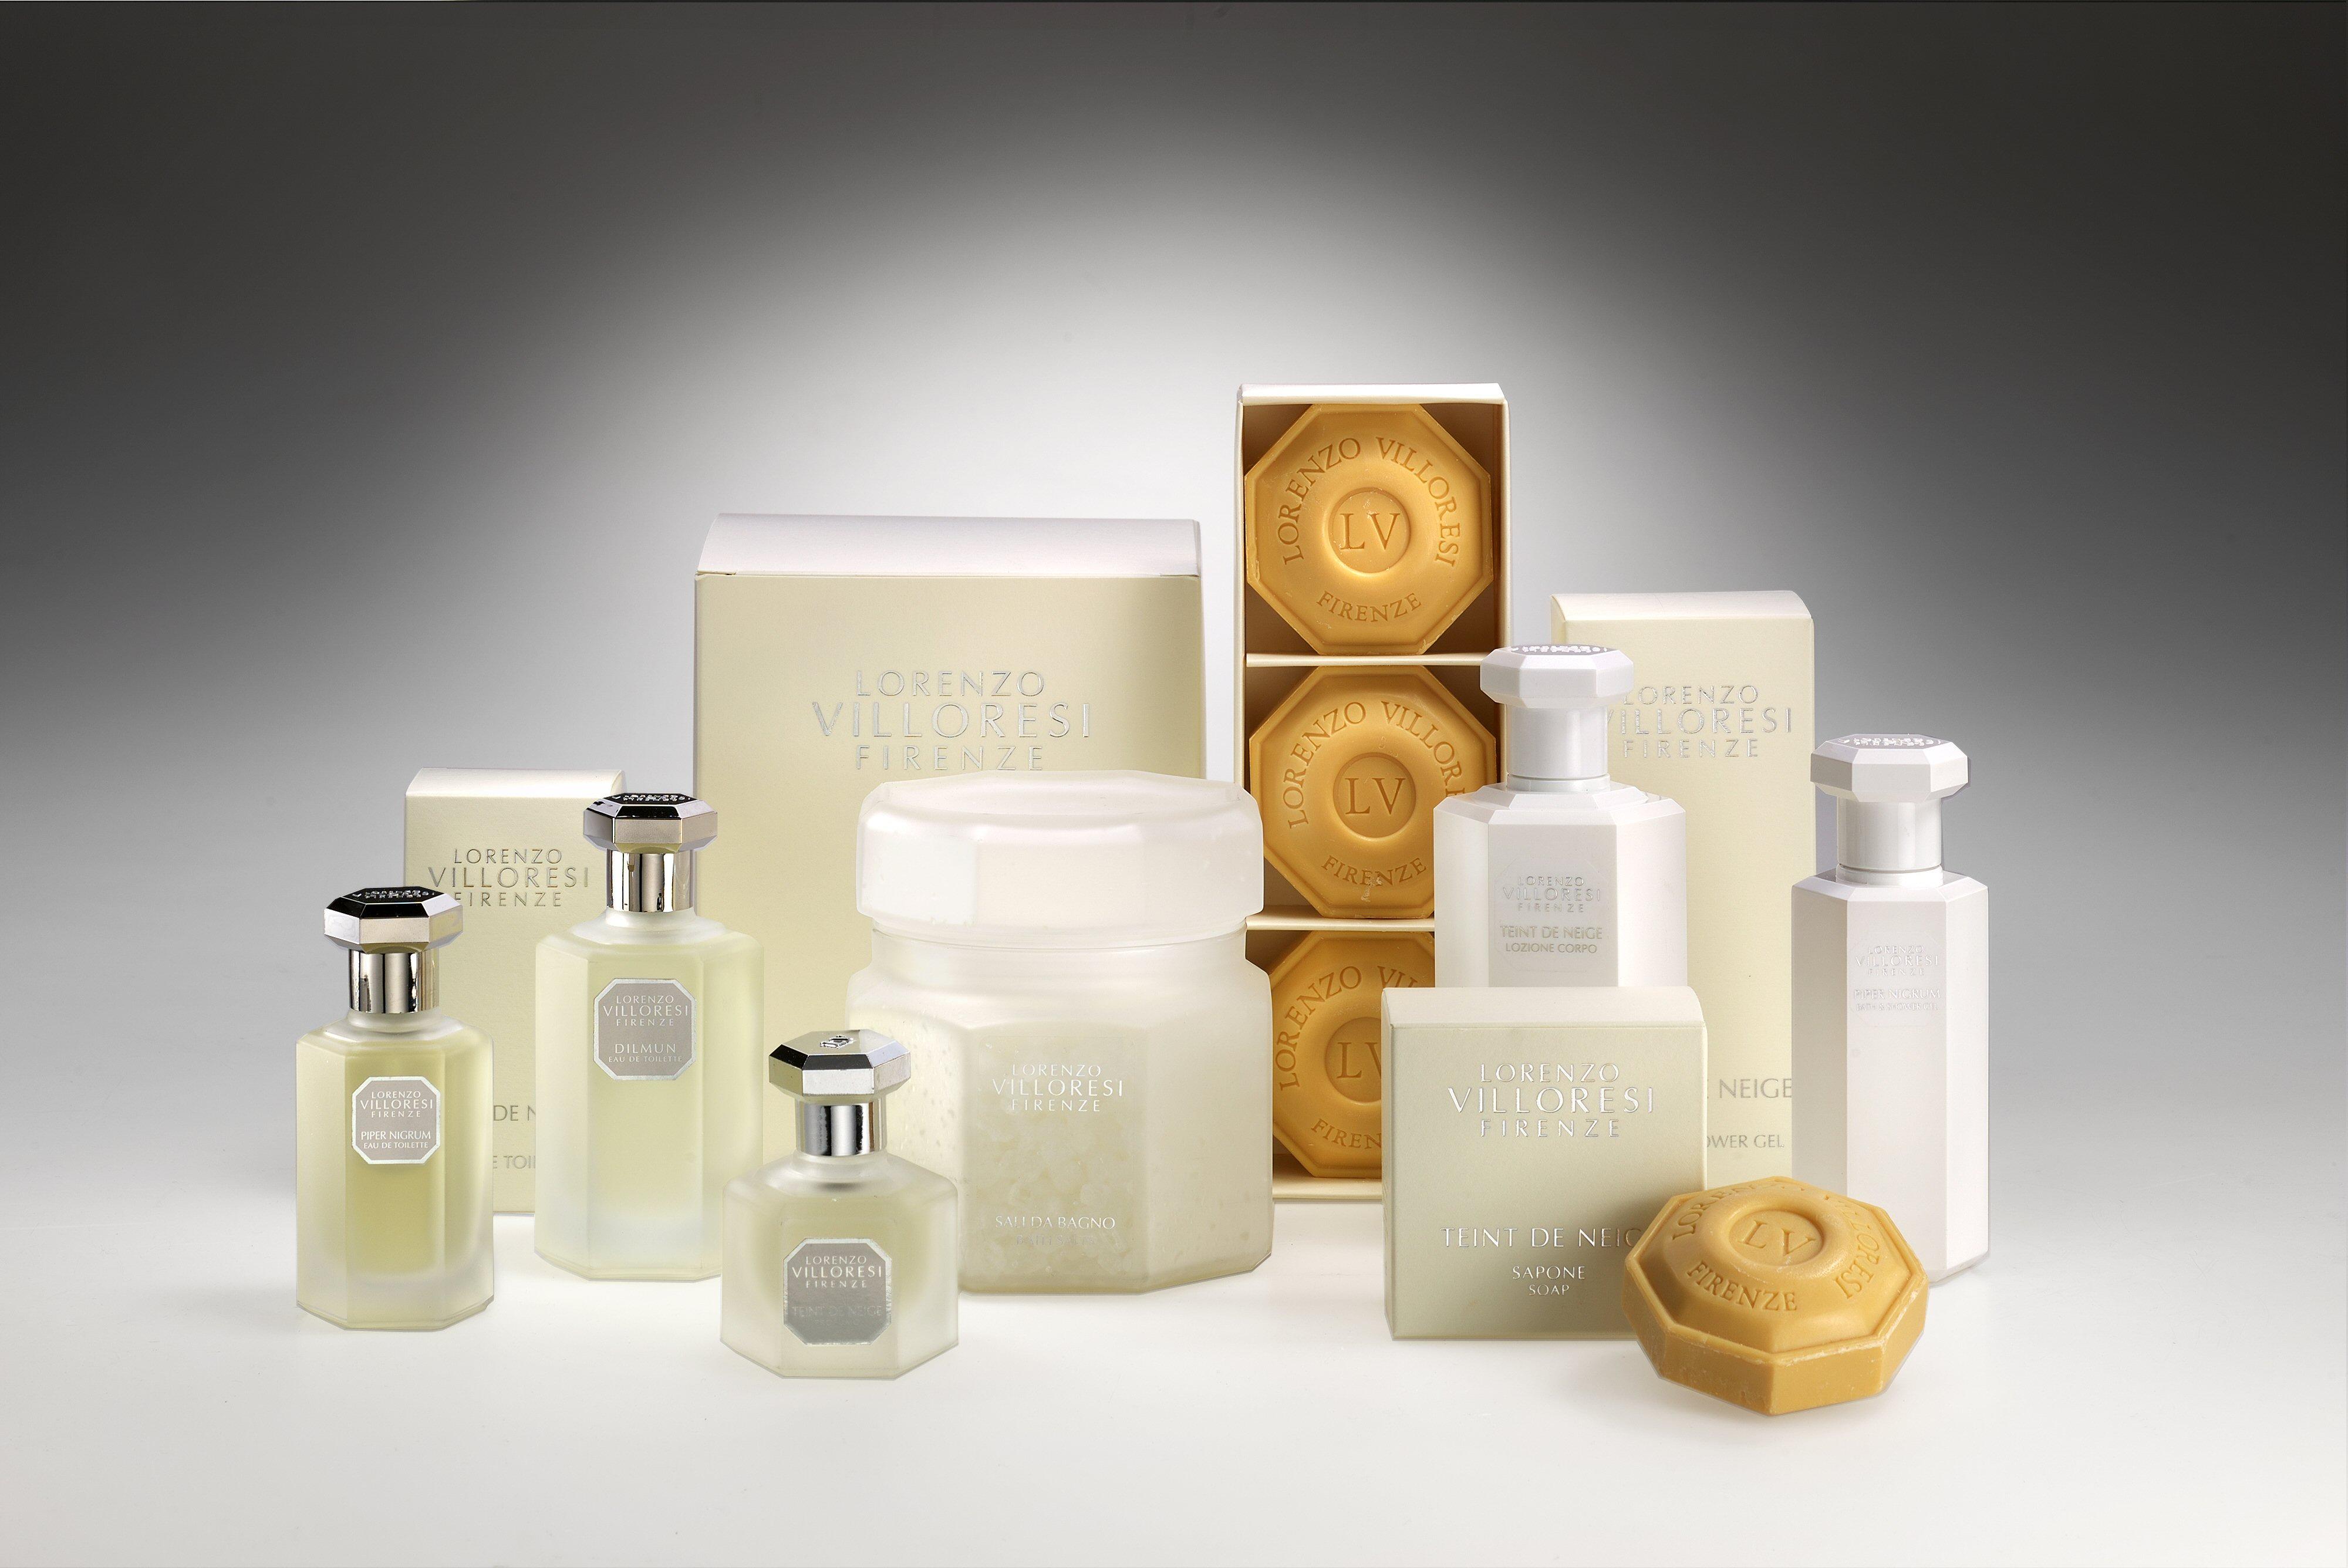 Produktgruppe Teint de Neige